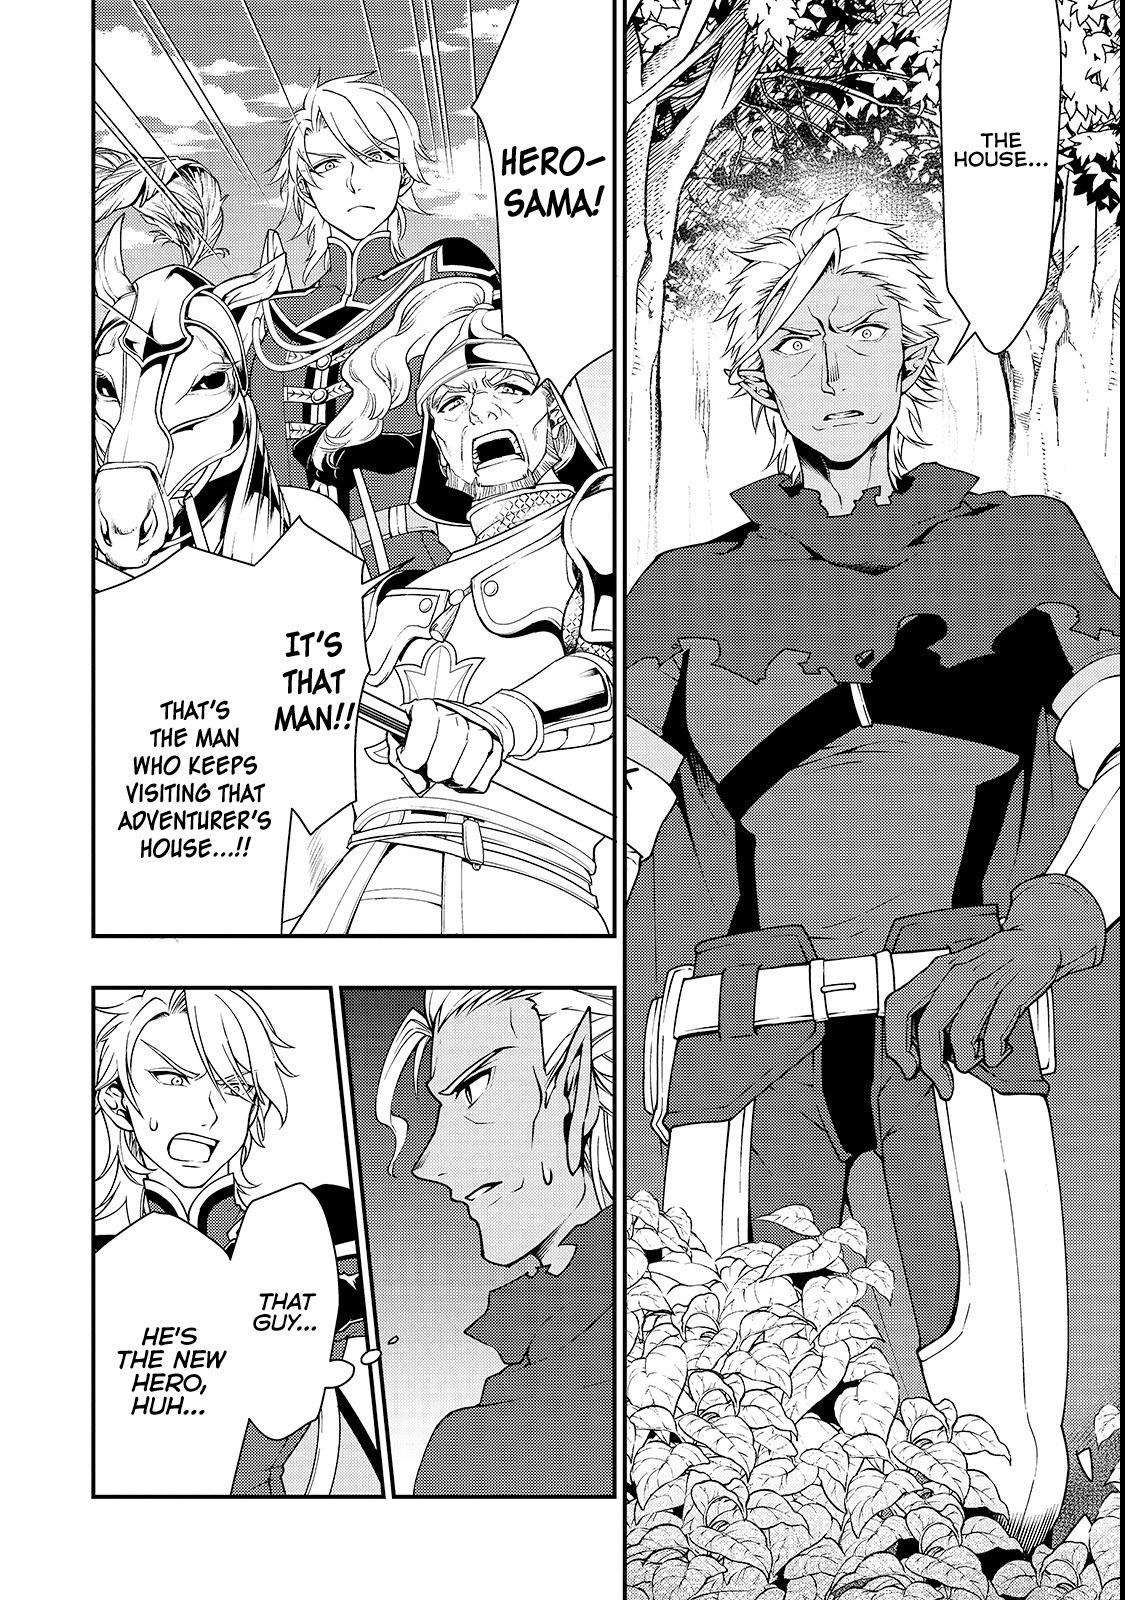 Lv2 kara Cheat datta Moto Yuusha Kouho no Mattari Isekai Life - chapter 9-eng-li